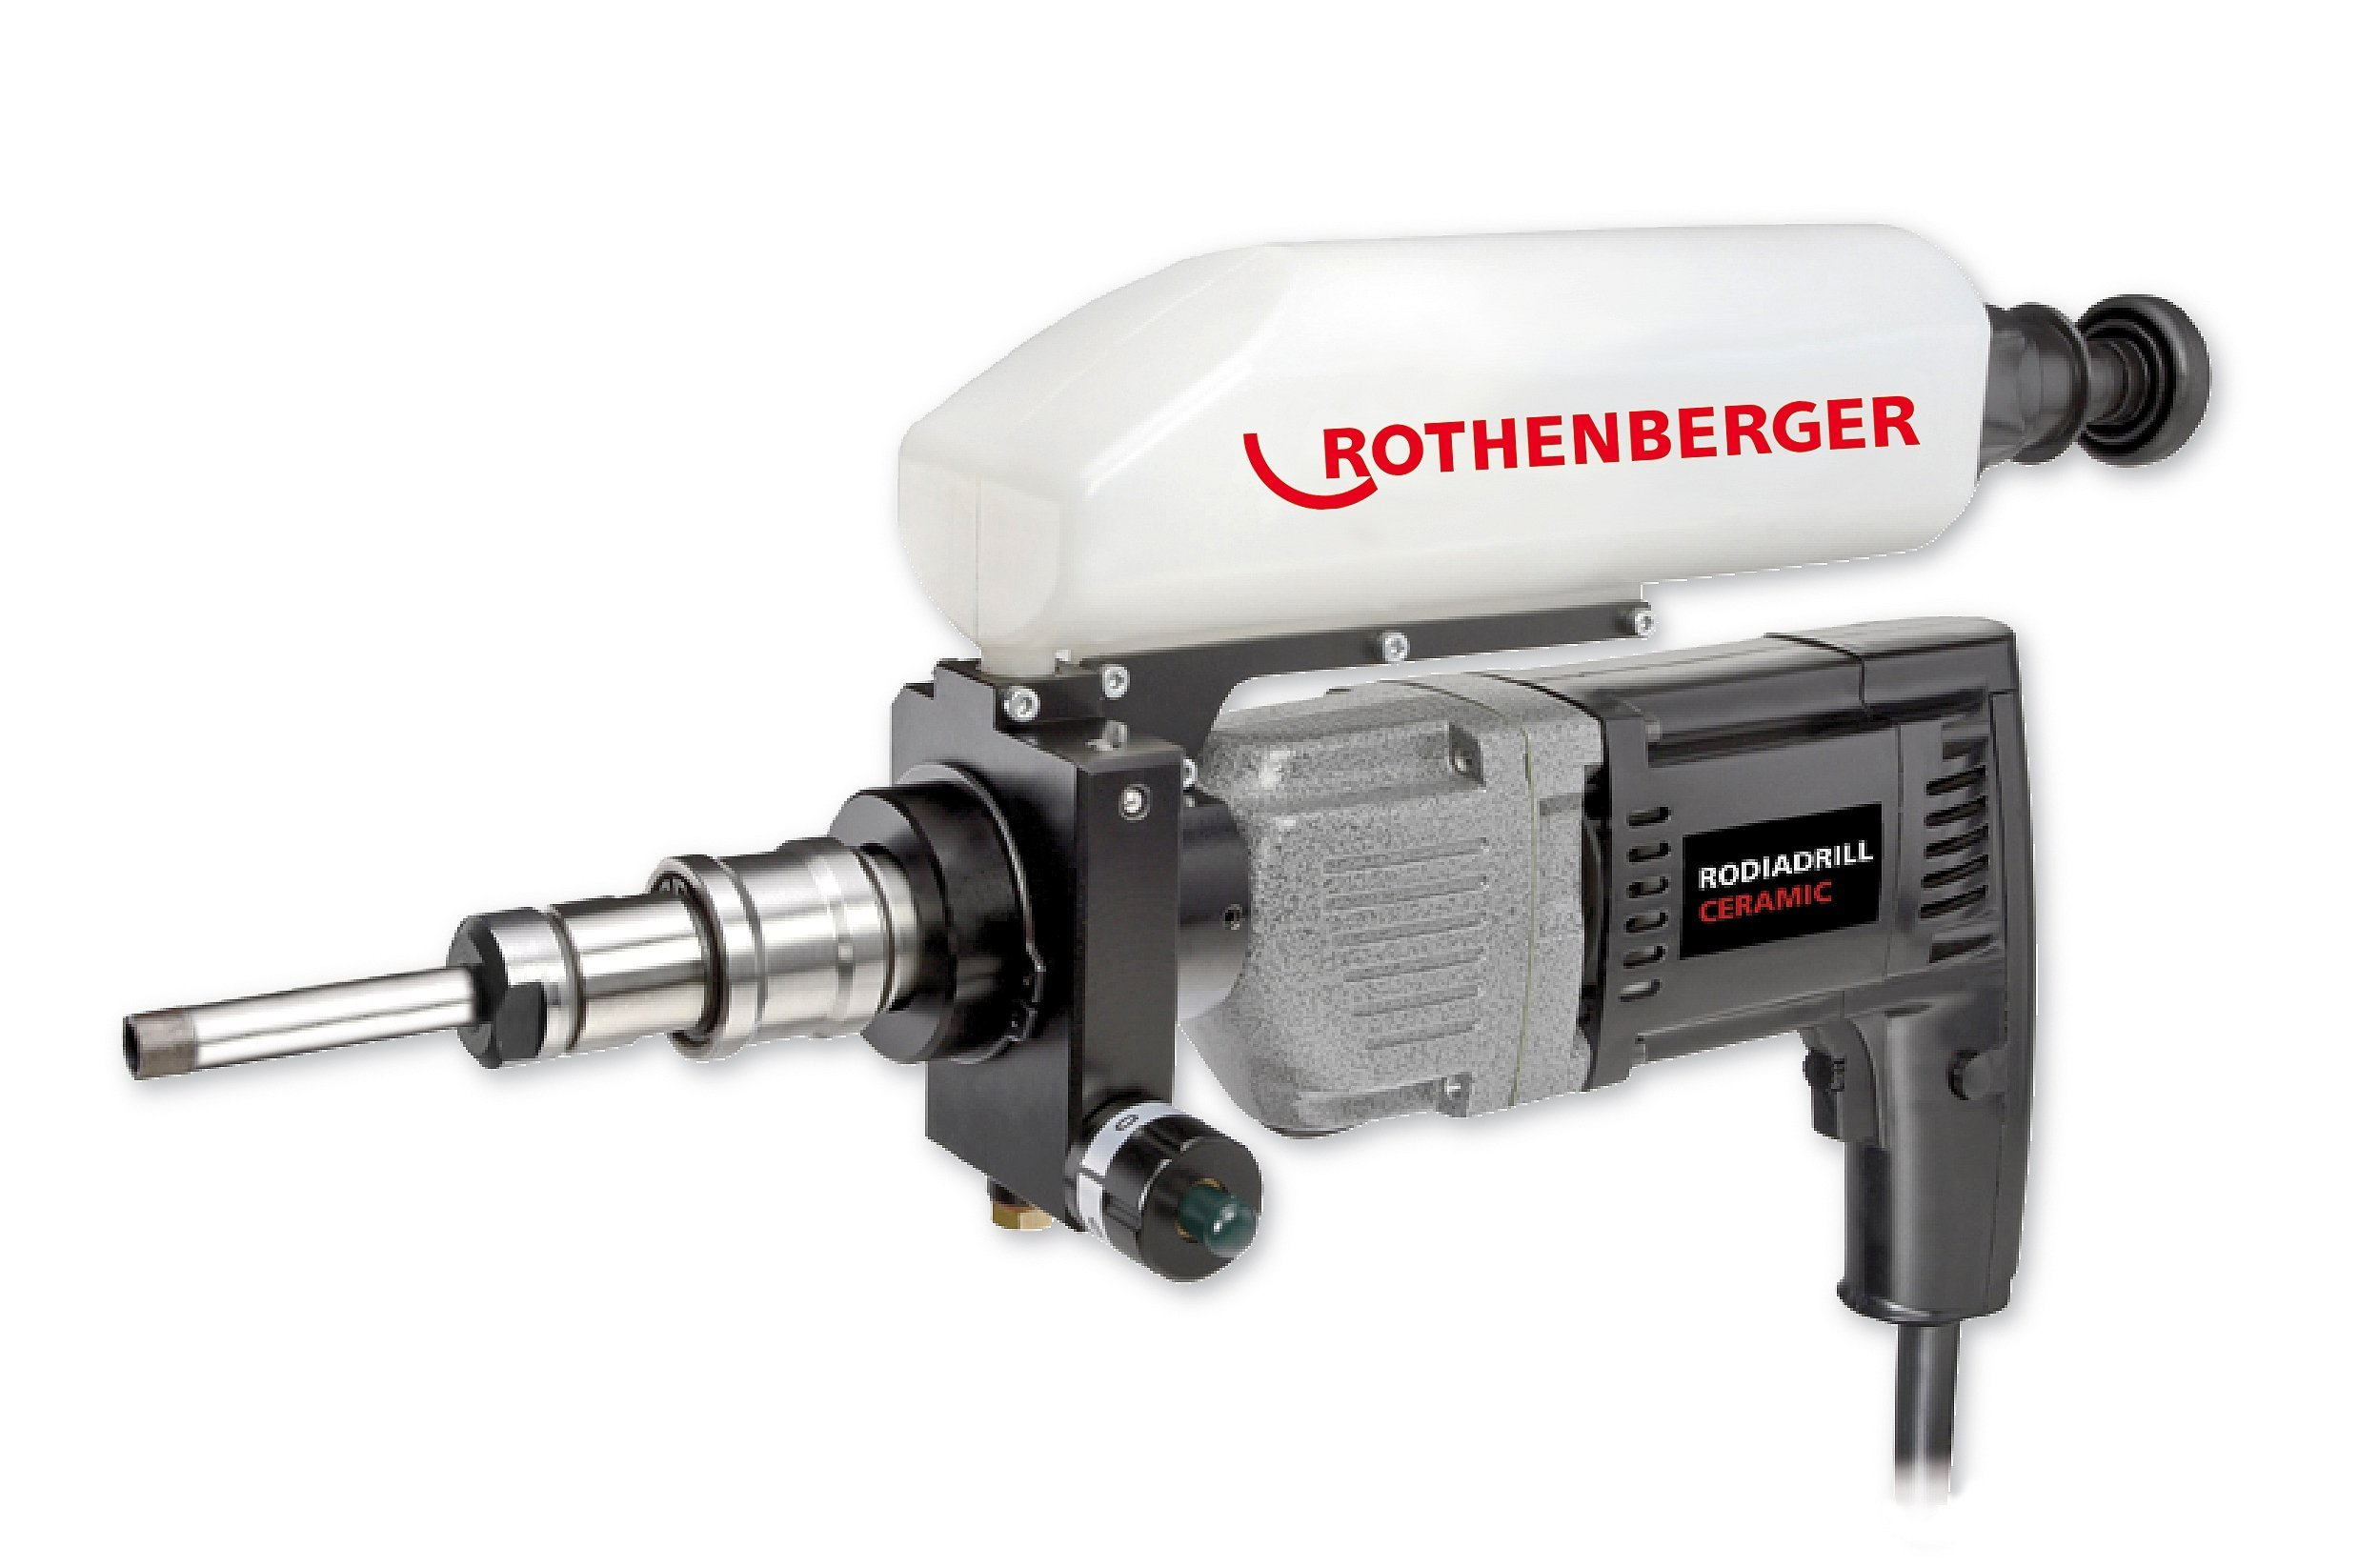 Rothenberger-Diamant-Fliesenbohrmaschine-Rodiadrill-Ceramic-inklusive-Bohrkronen-Set-1-Stck-FF40150